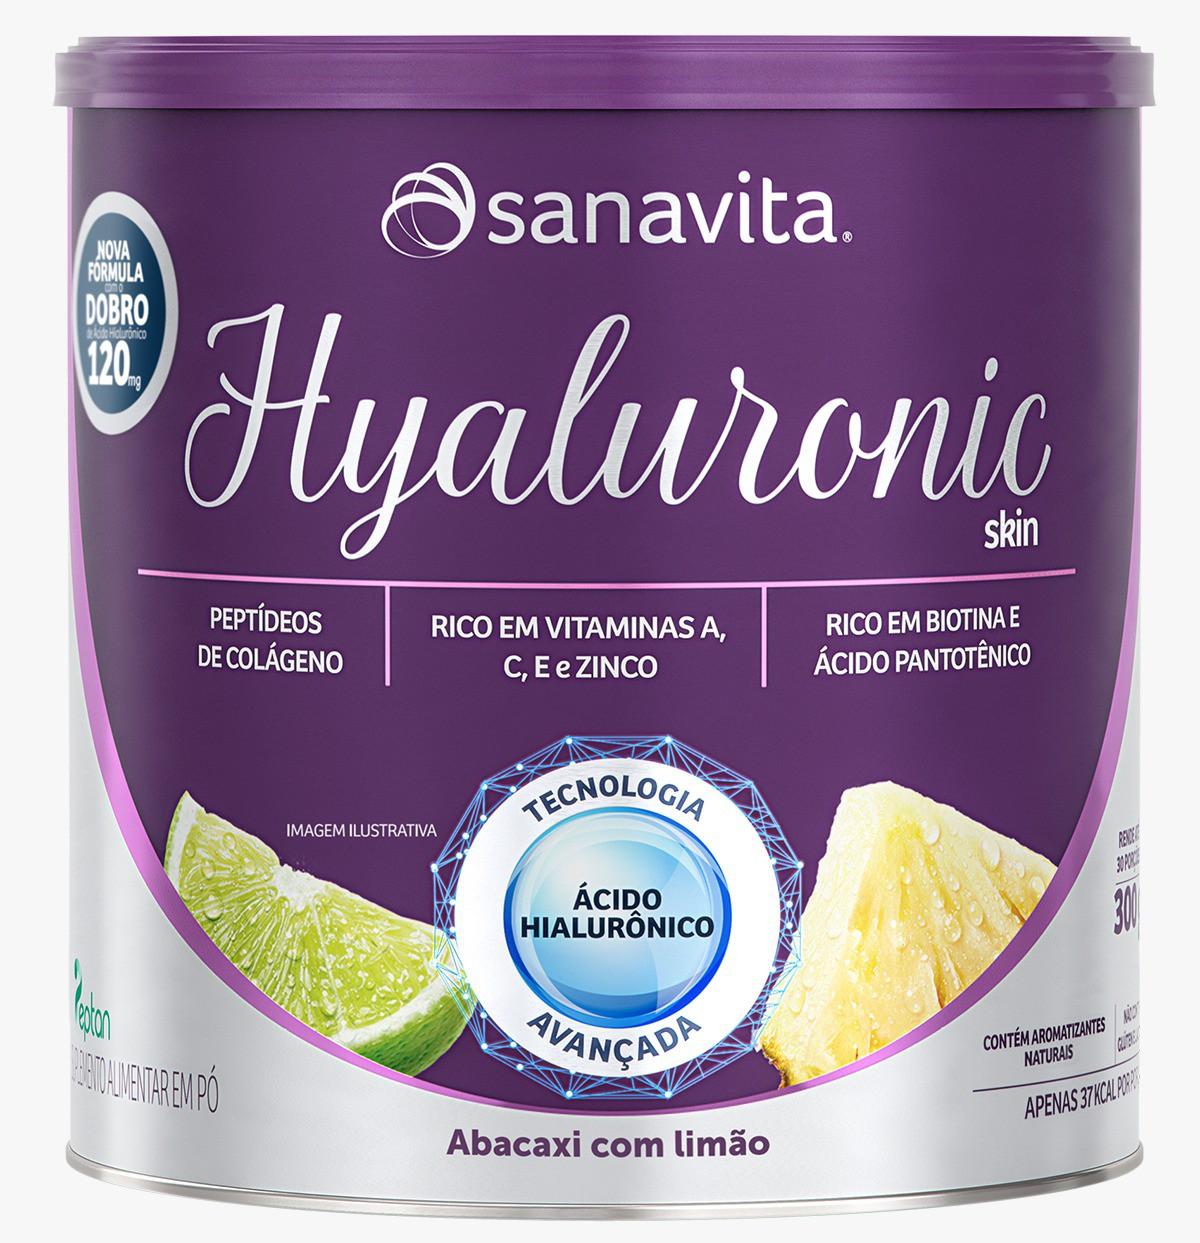 Hyaluronic  Skin Abacaxi Com Limão 300 Gramas - Sanavita